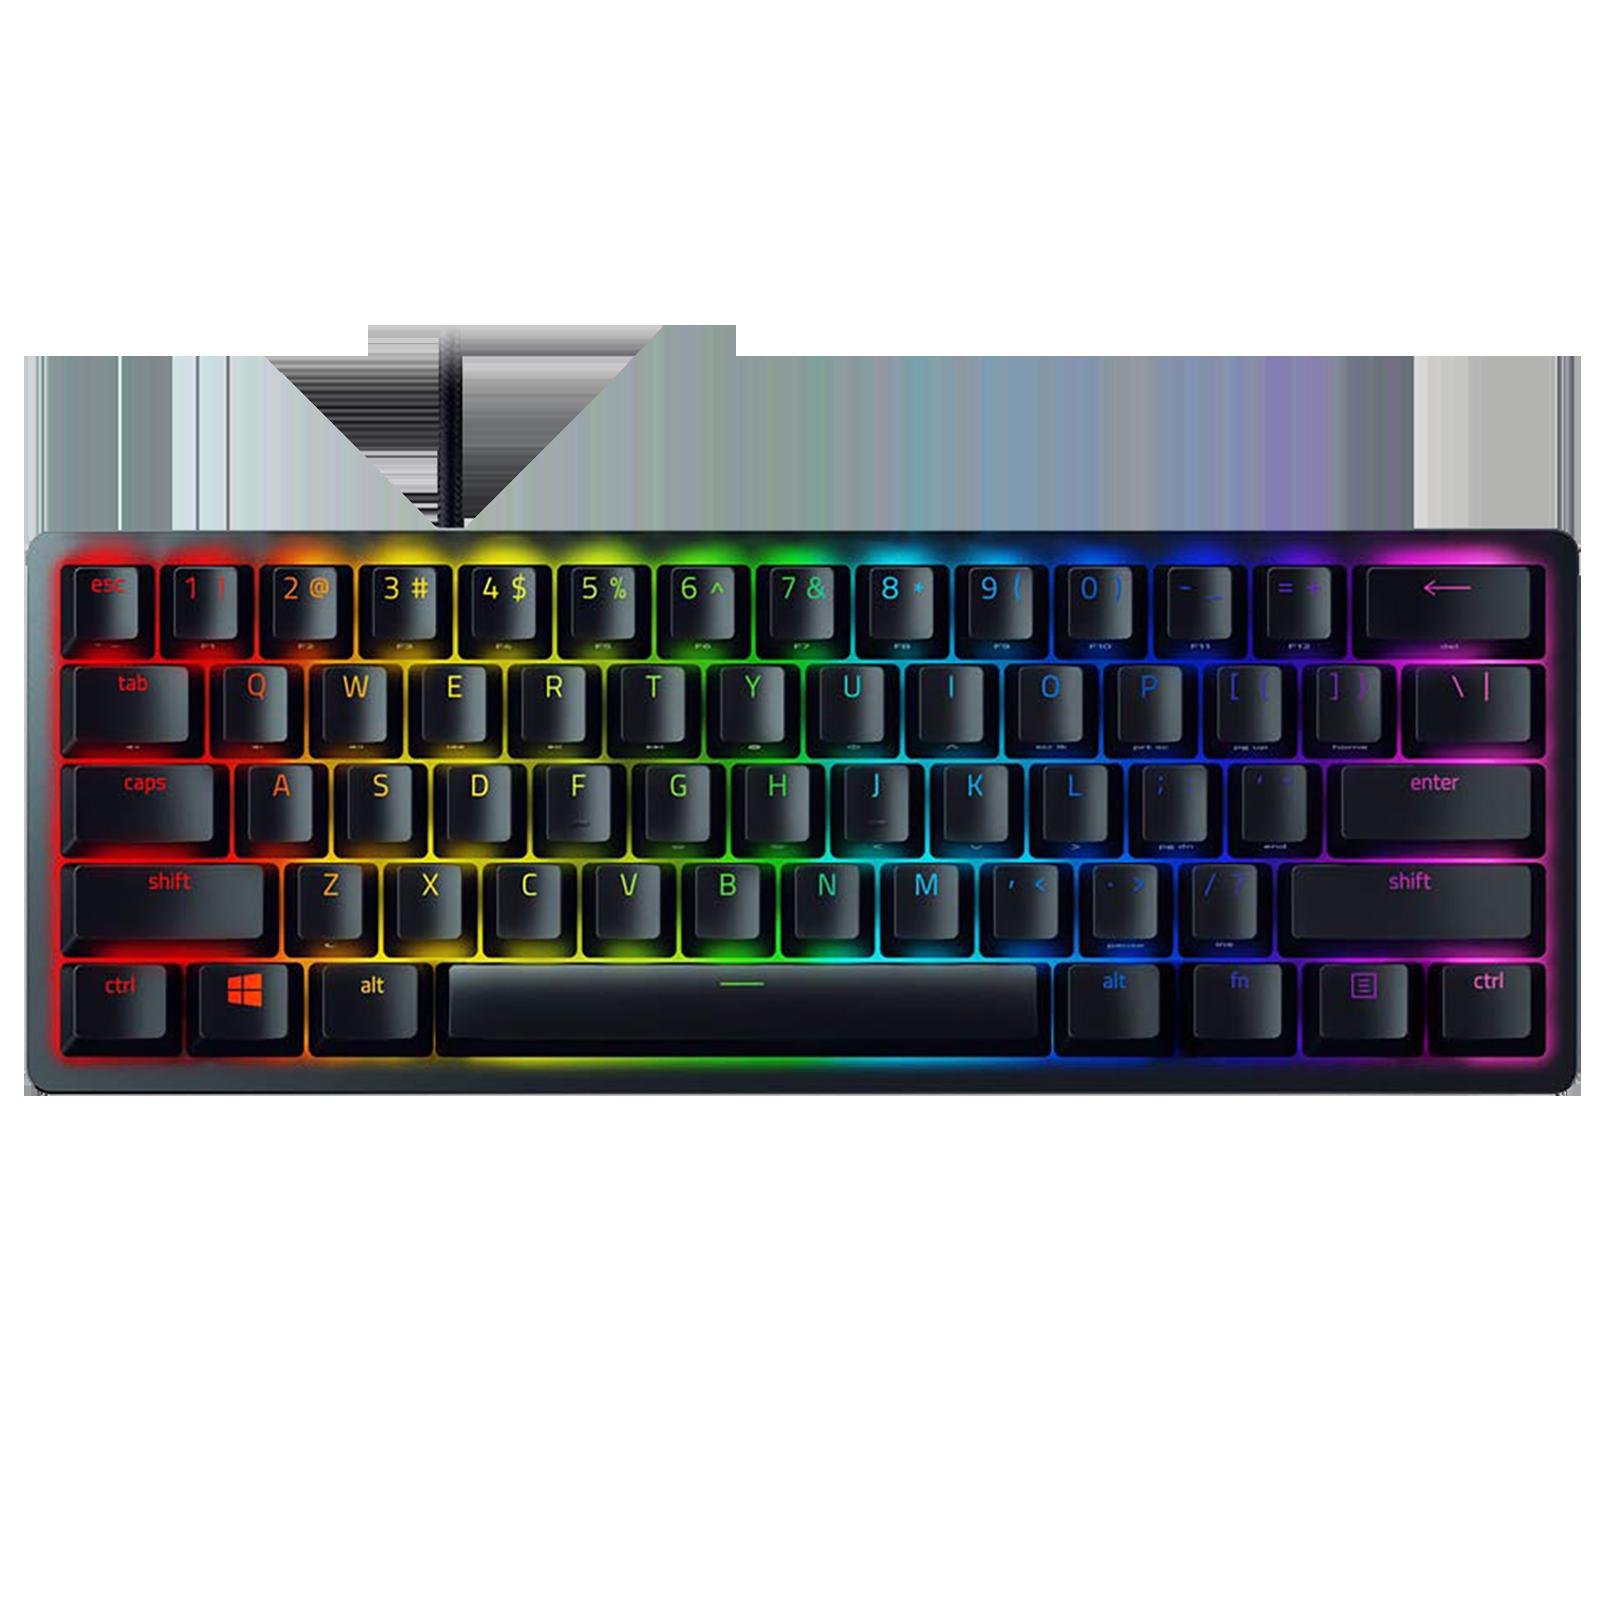 Razer Huntsman Mini Wired Gaming Keyboard (60% Linear Optical Switch, RZ03-03390200-R3M1, Black)_1